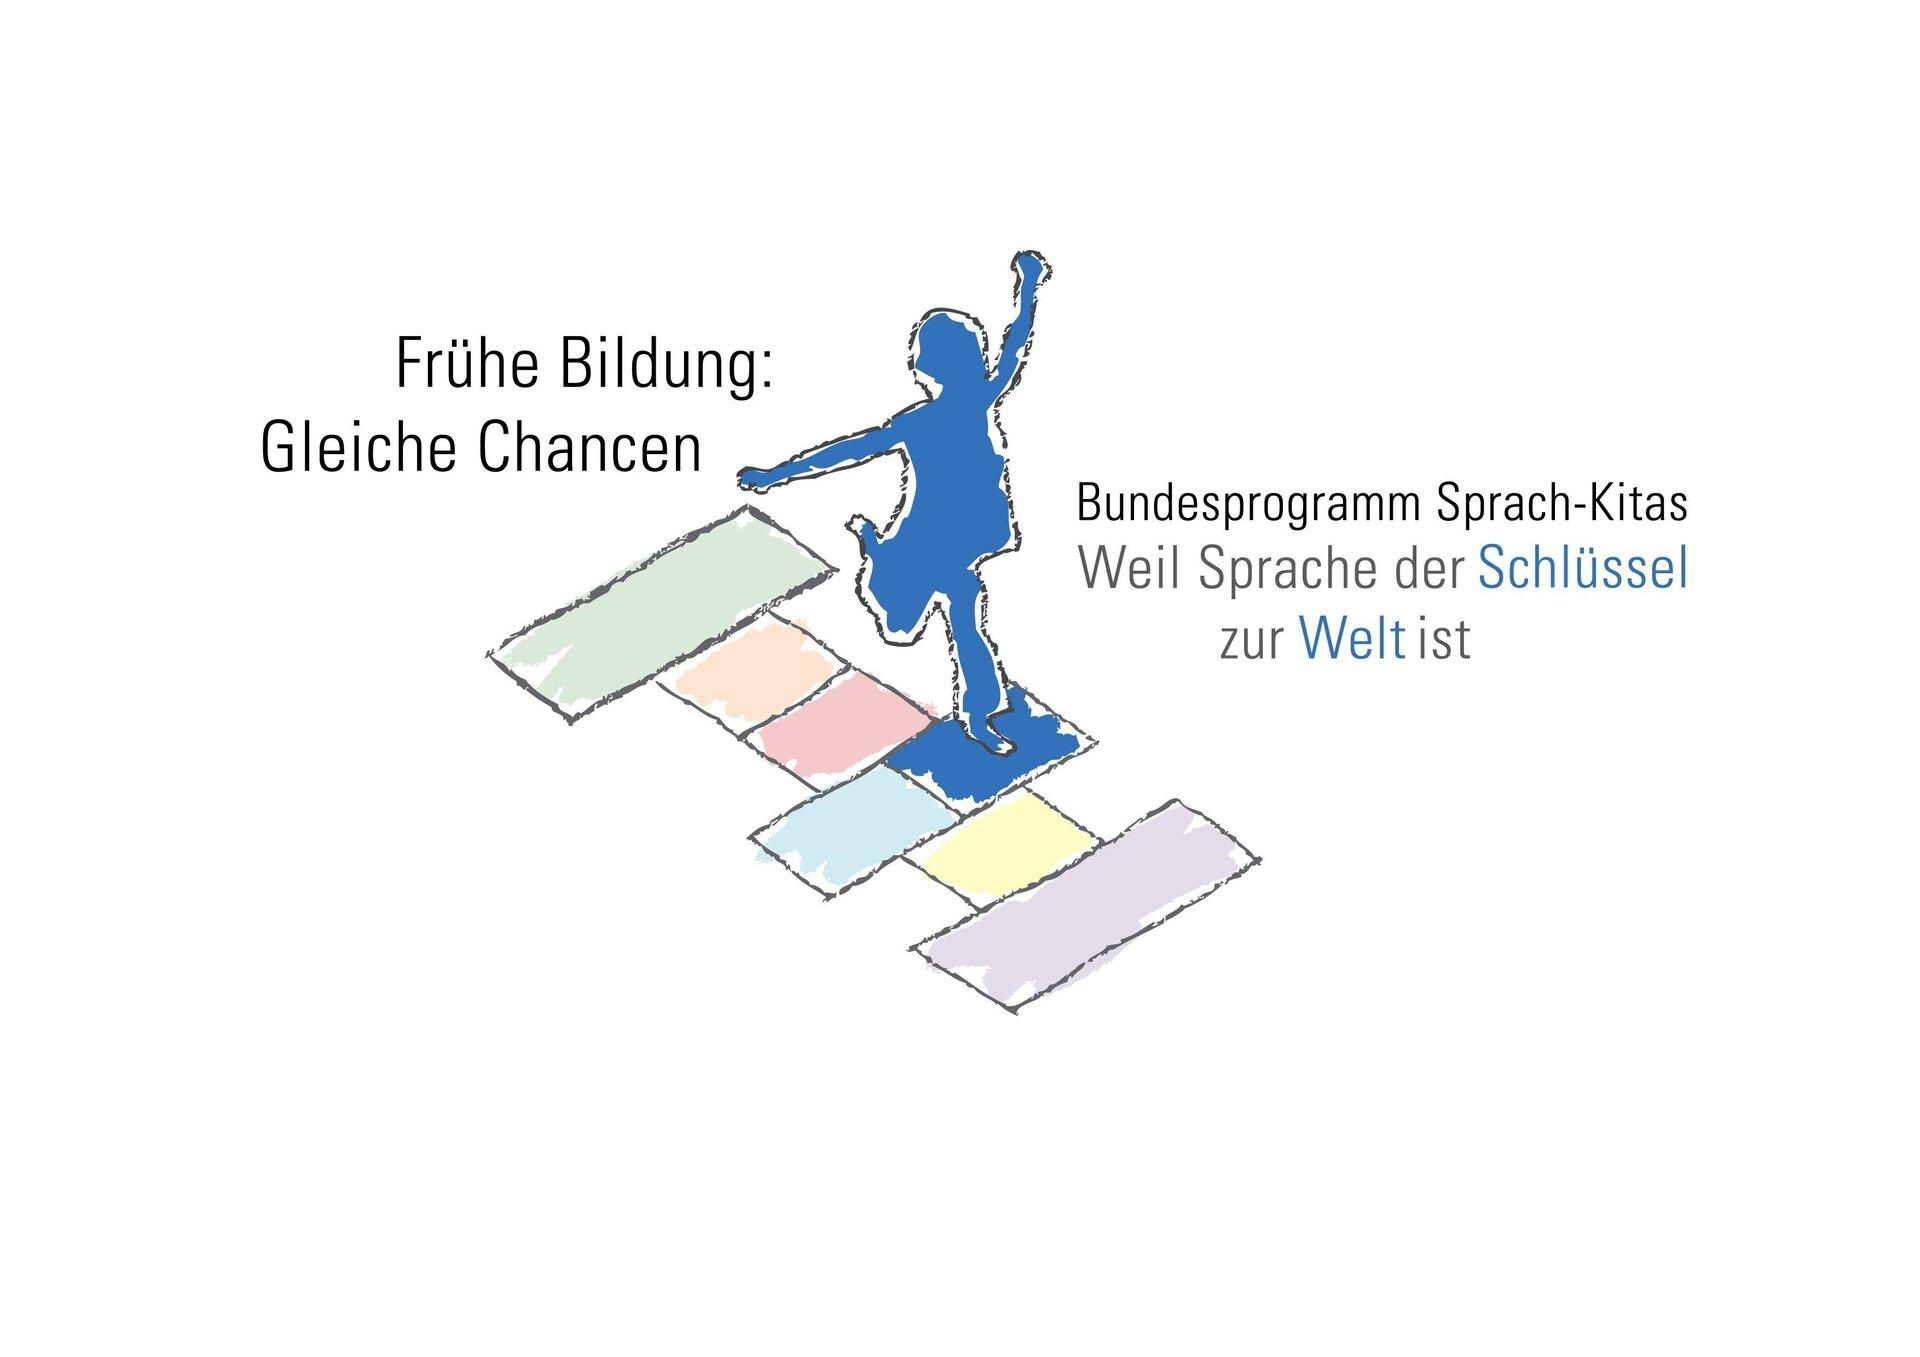 Bundesprogramm Sptrachkitas